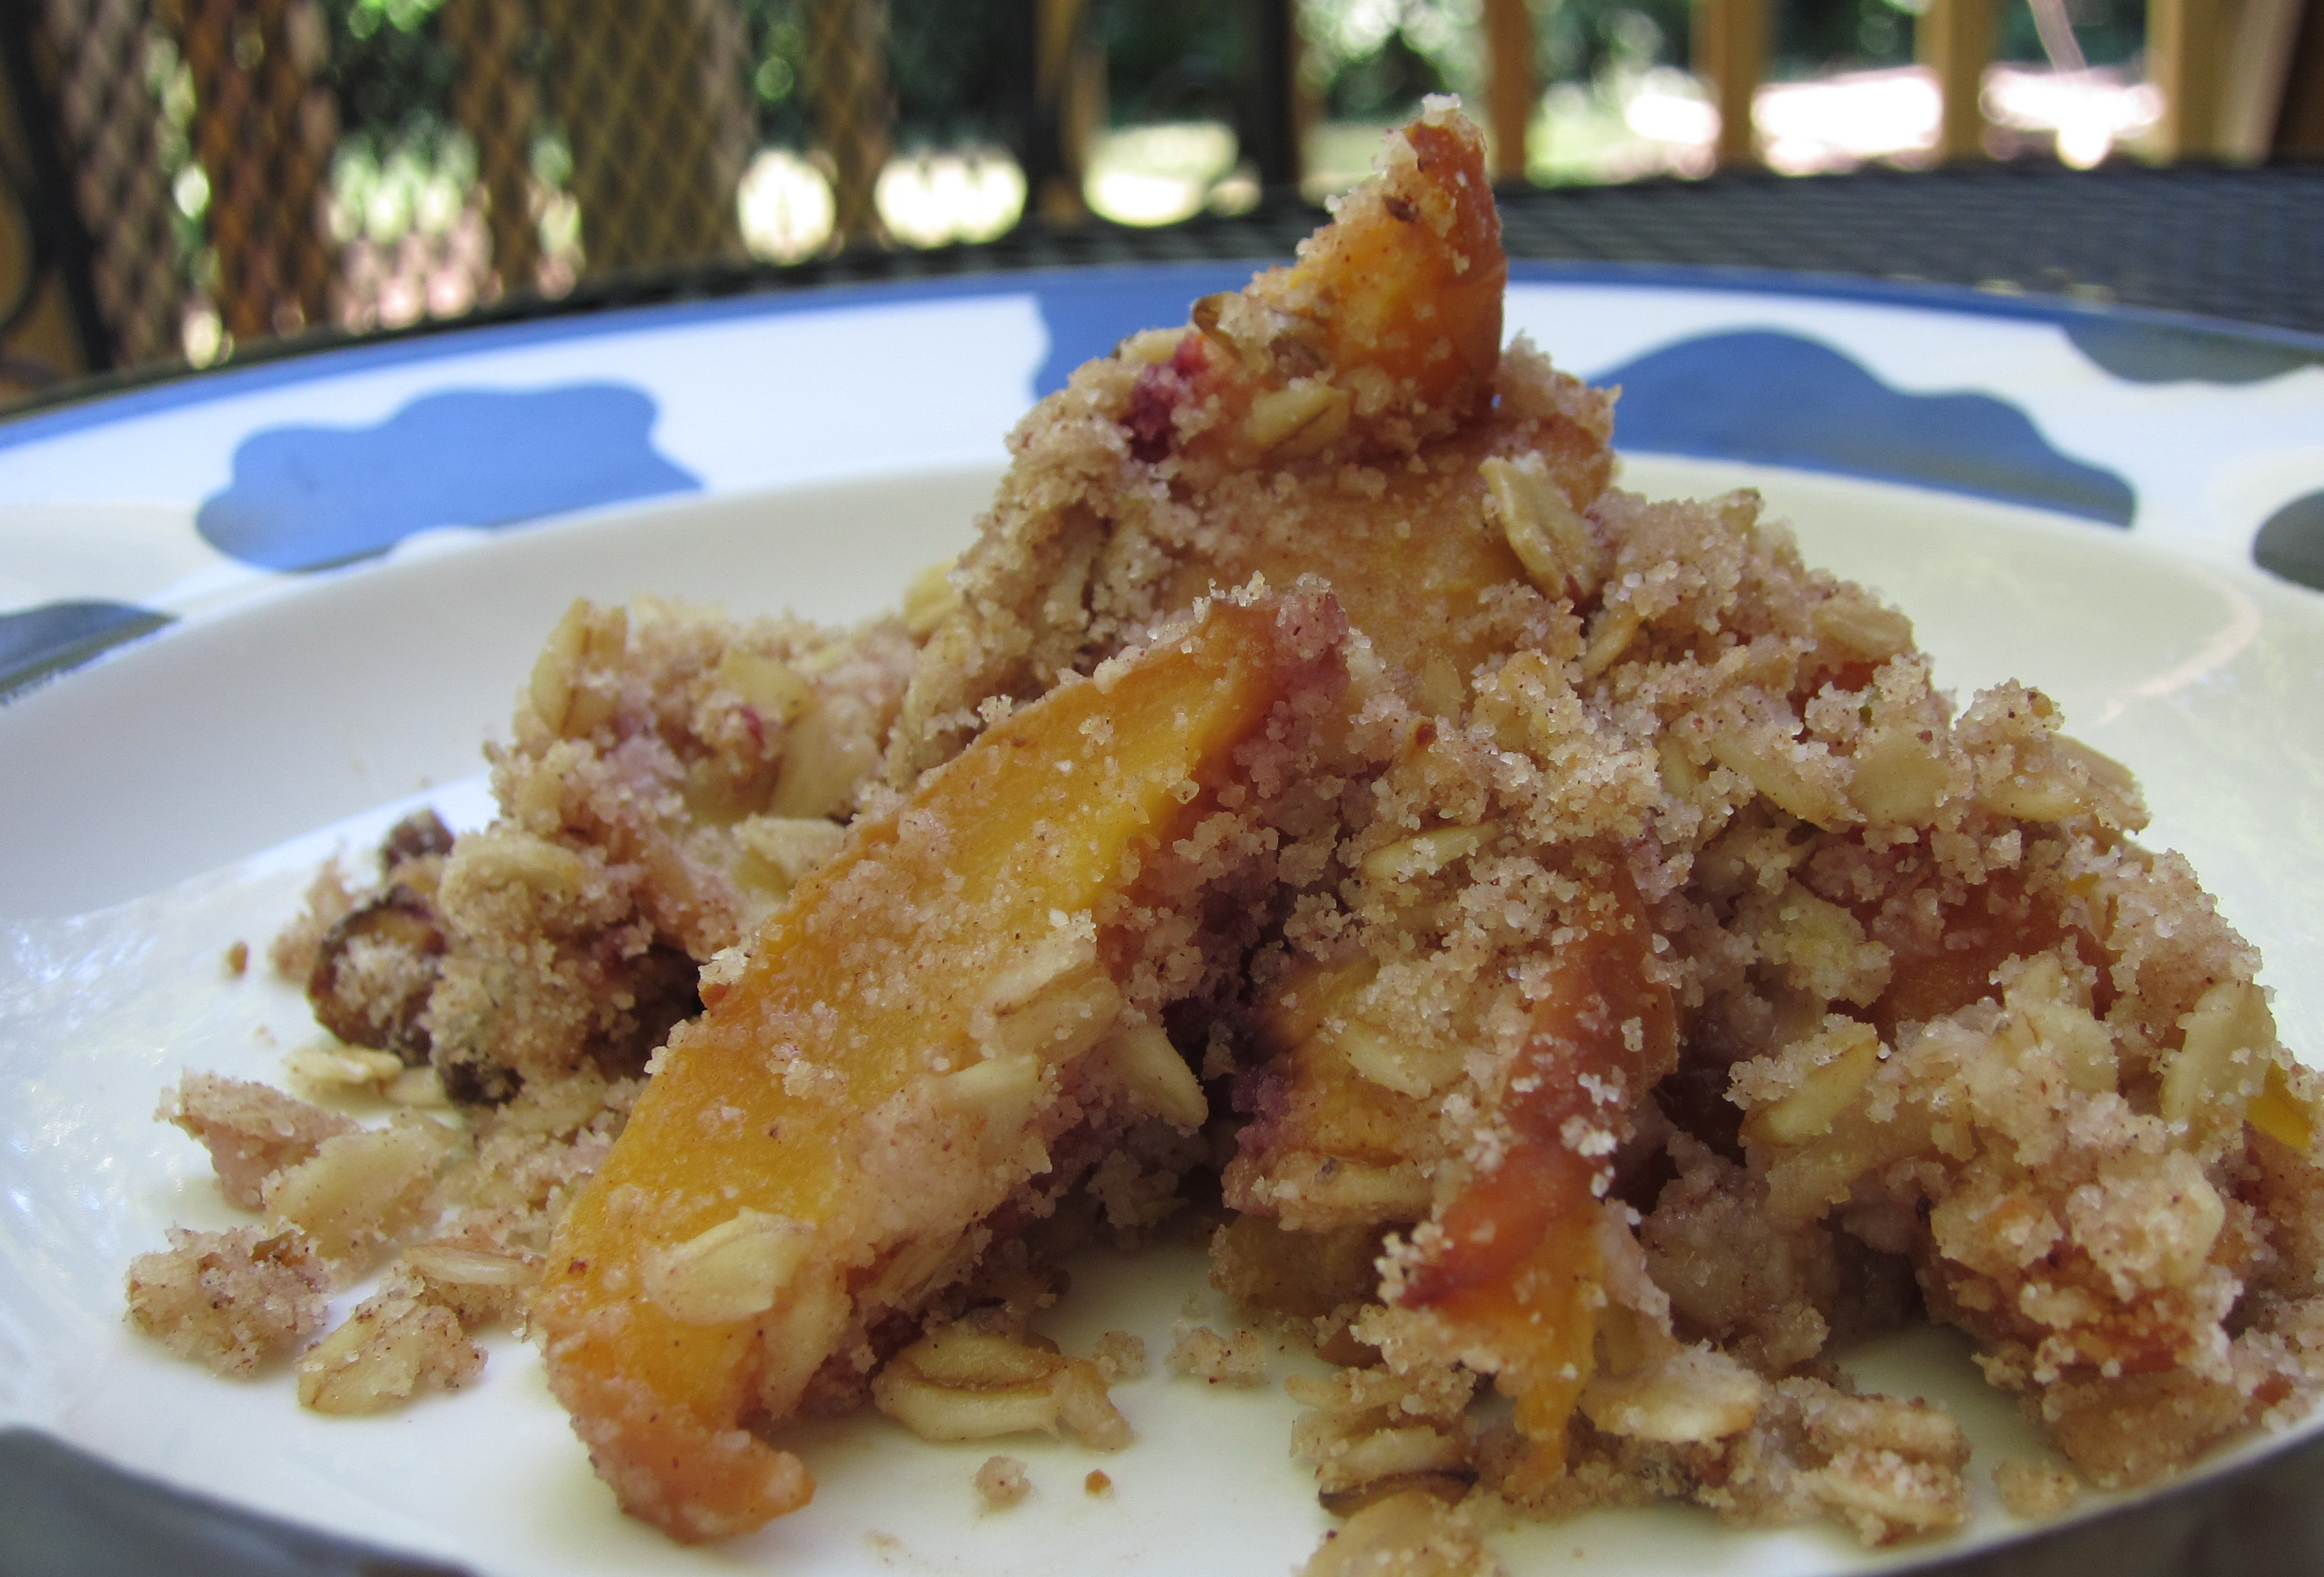 Peach pistachio crumble